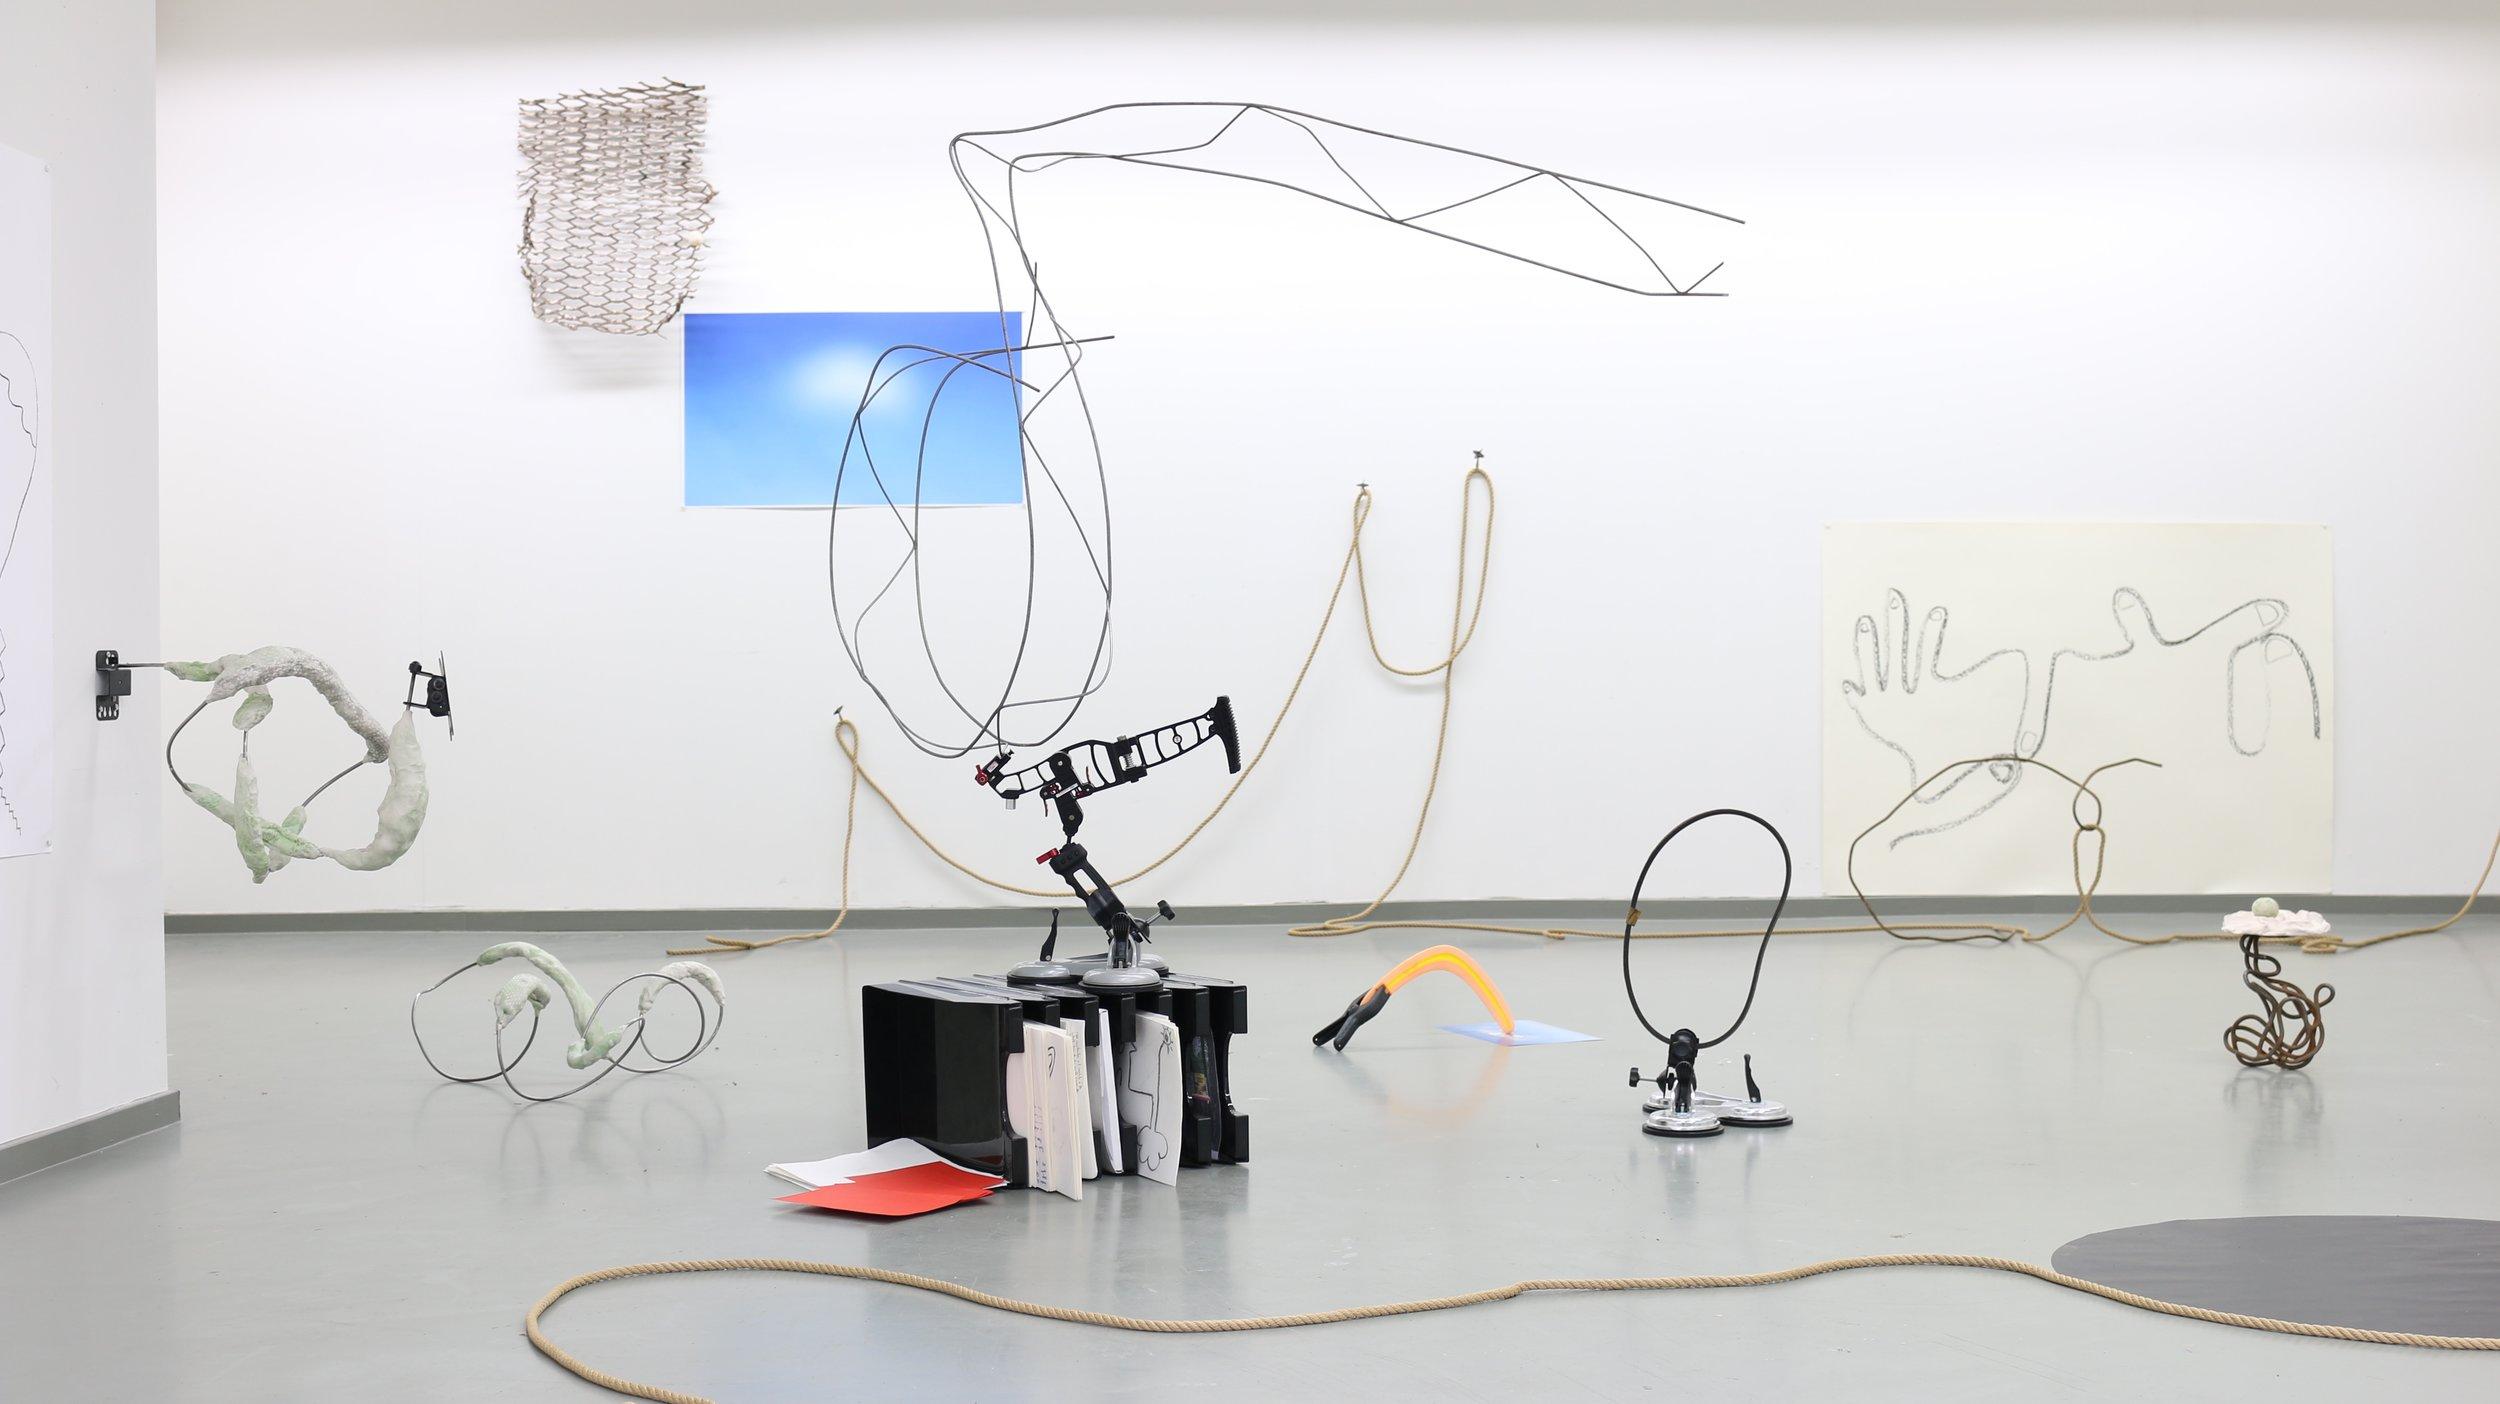 loopholes, exhibition view at jan van eyck academie, maastricht nl, 2018.